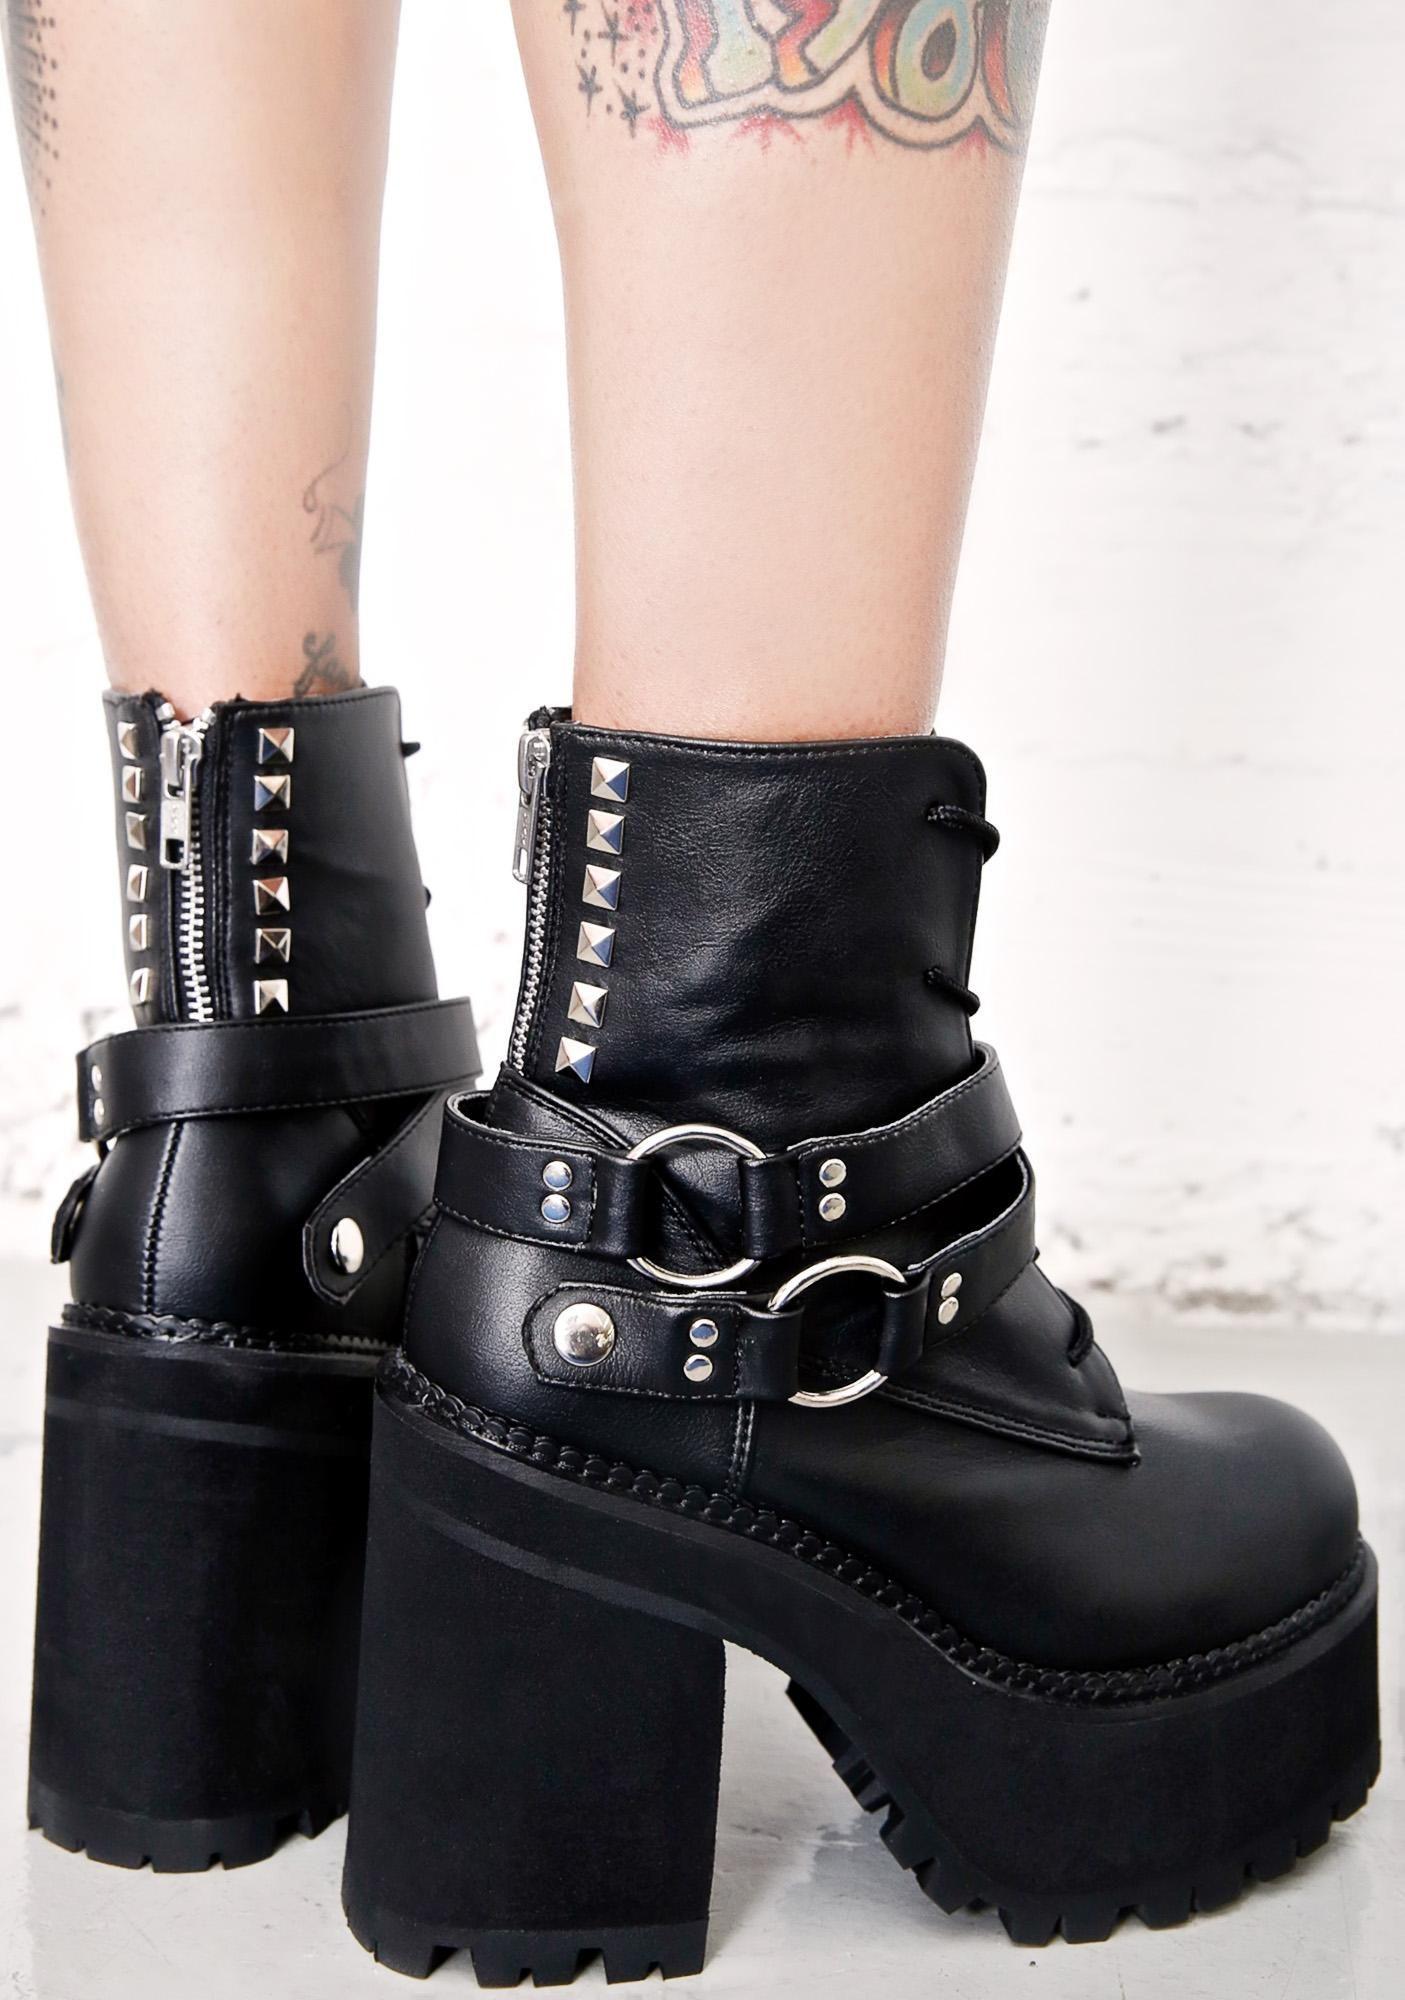 Demonia Reign Of Terror Platform Boots 105938d14f